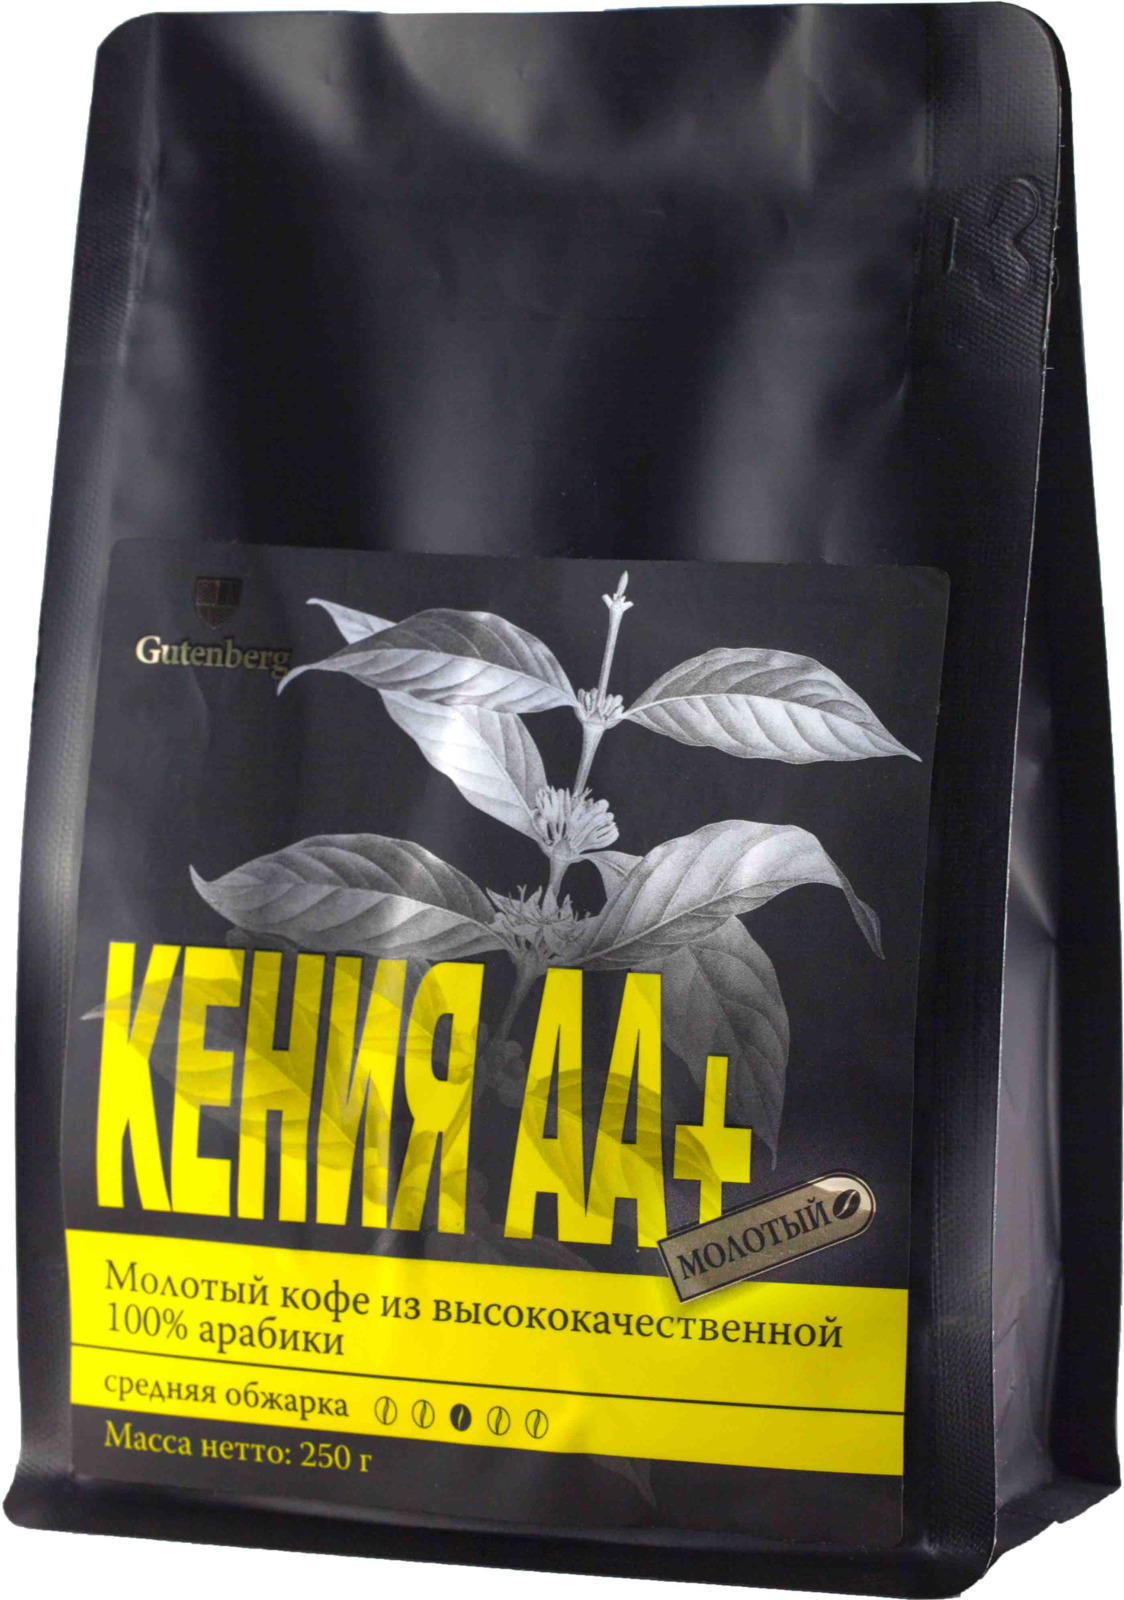 garuda bali кофе молотый 250 г Кофе молотый Gutenberg Кения Аа+, 250 г